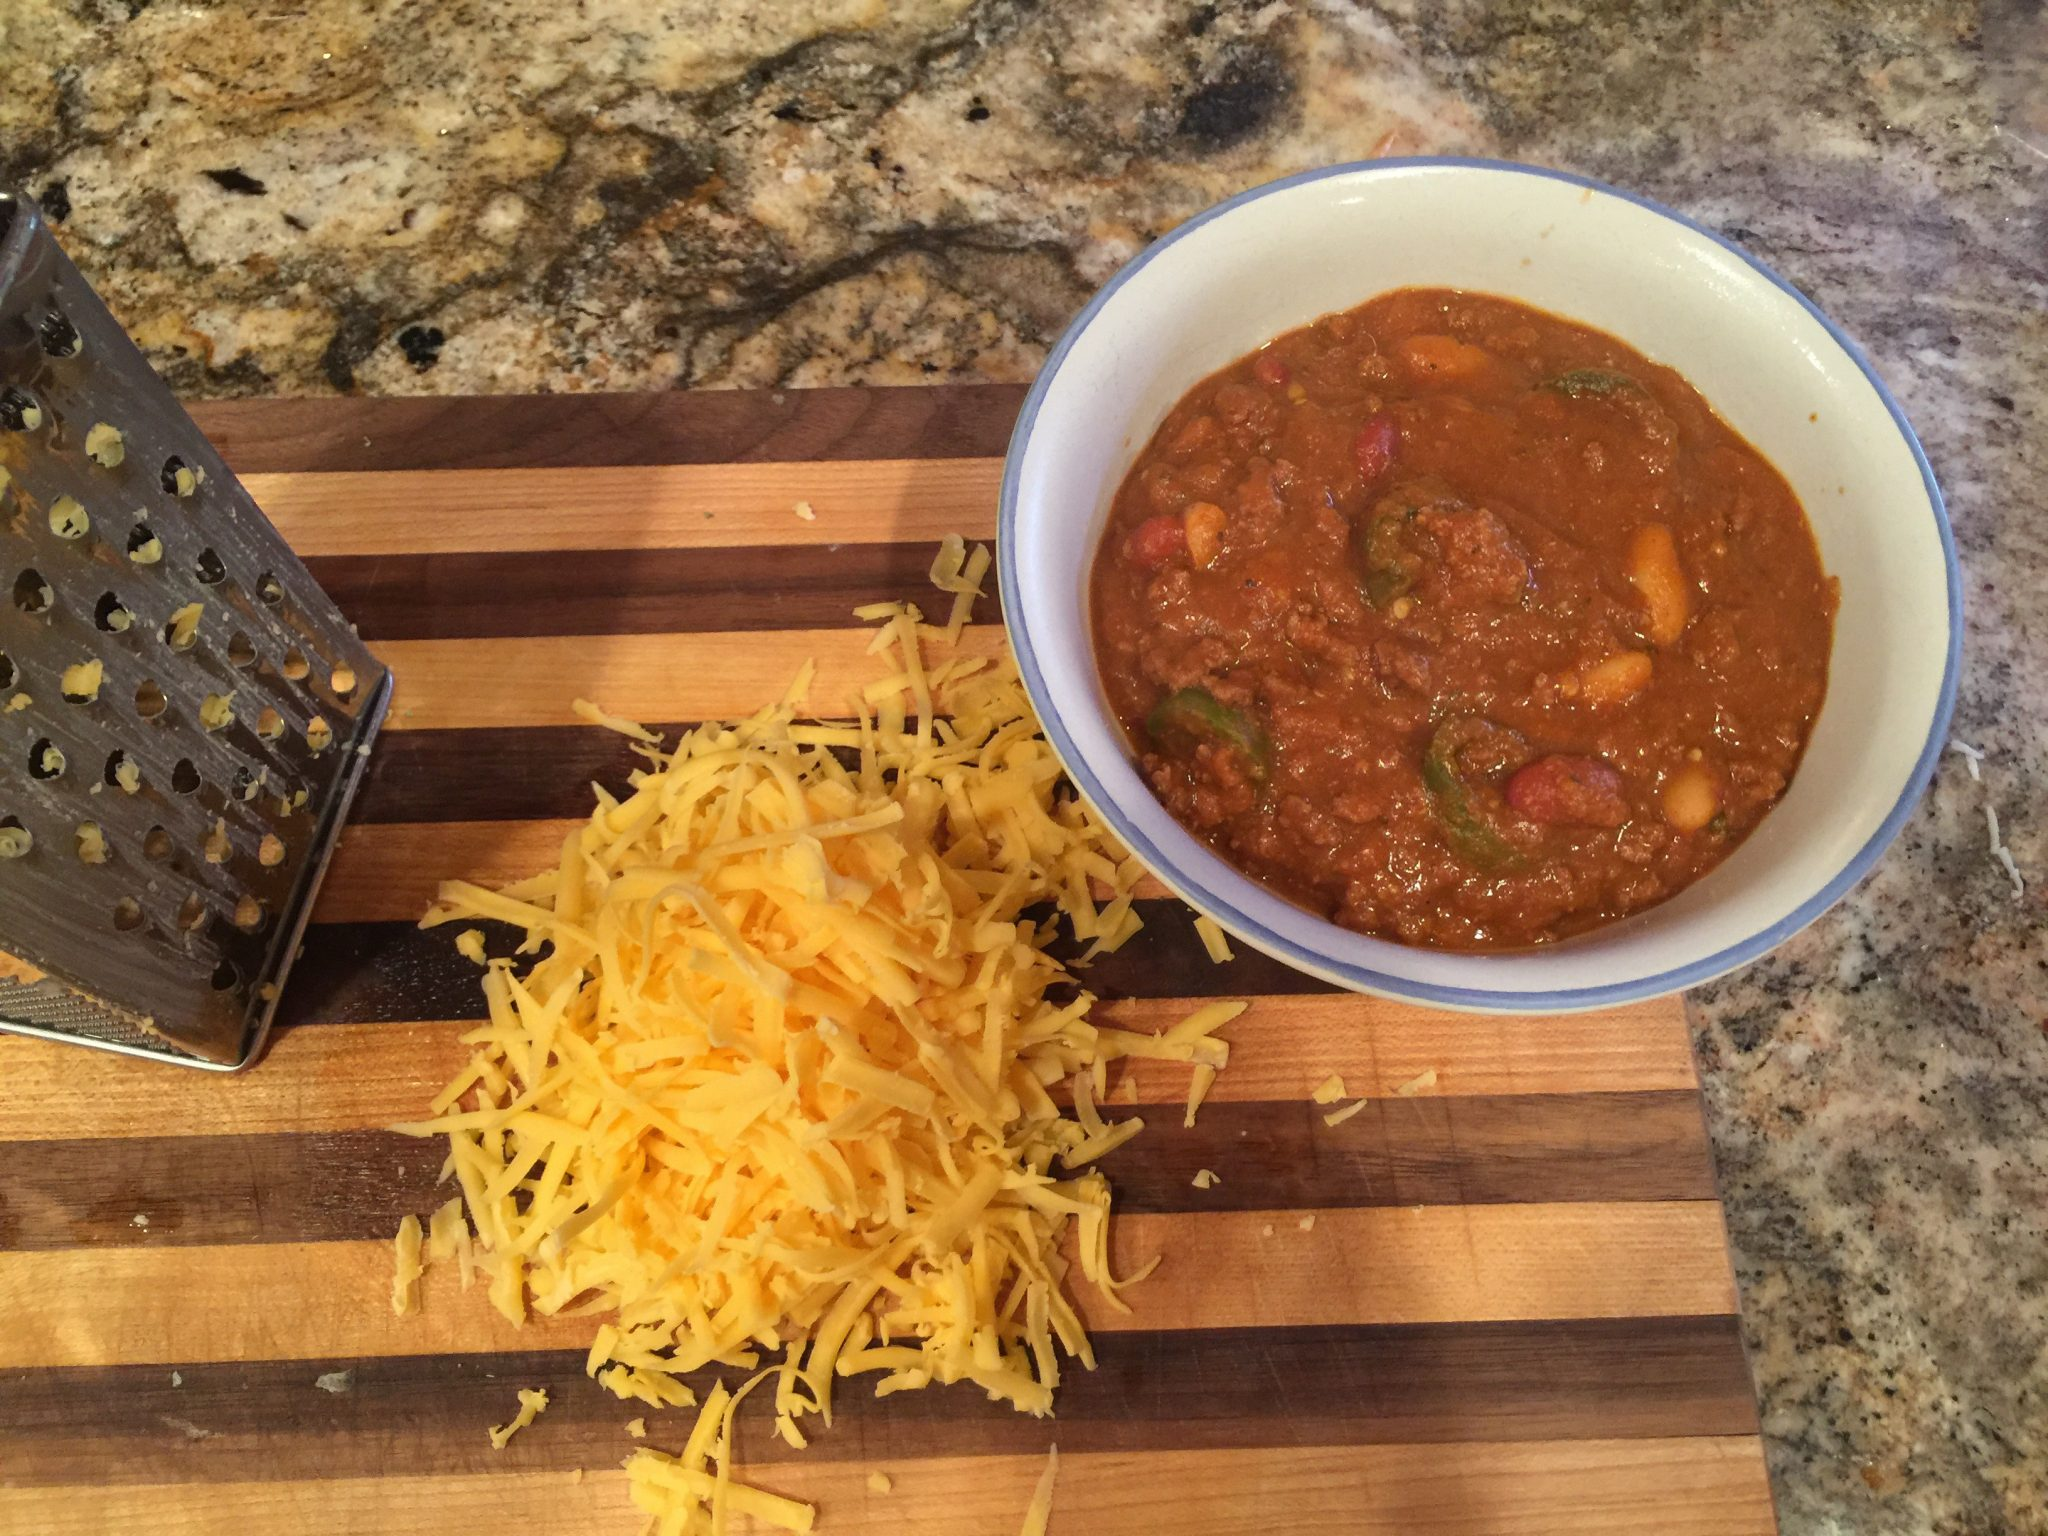 Spicy Jalapeño Crock Pot Chili